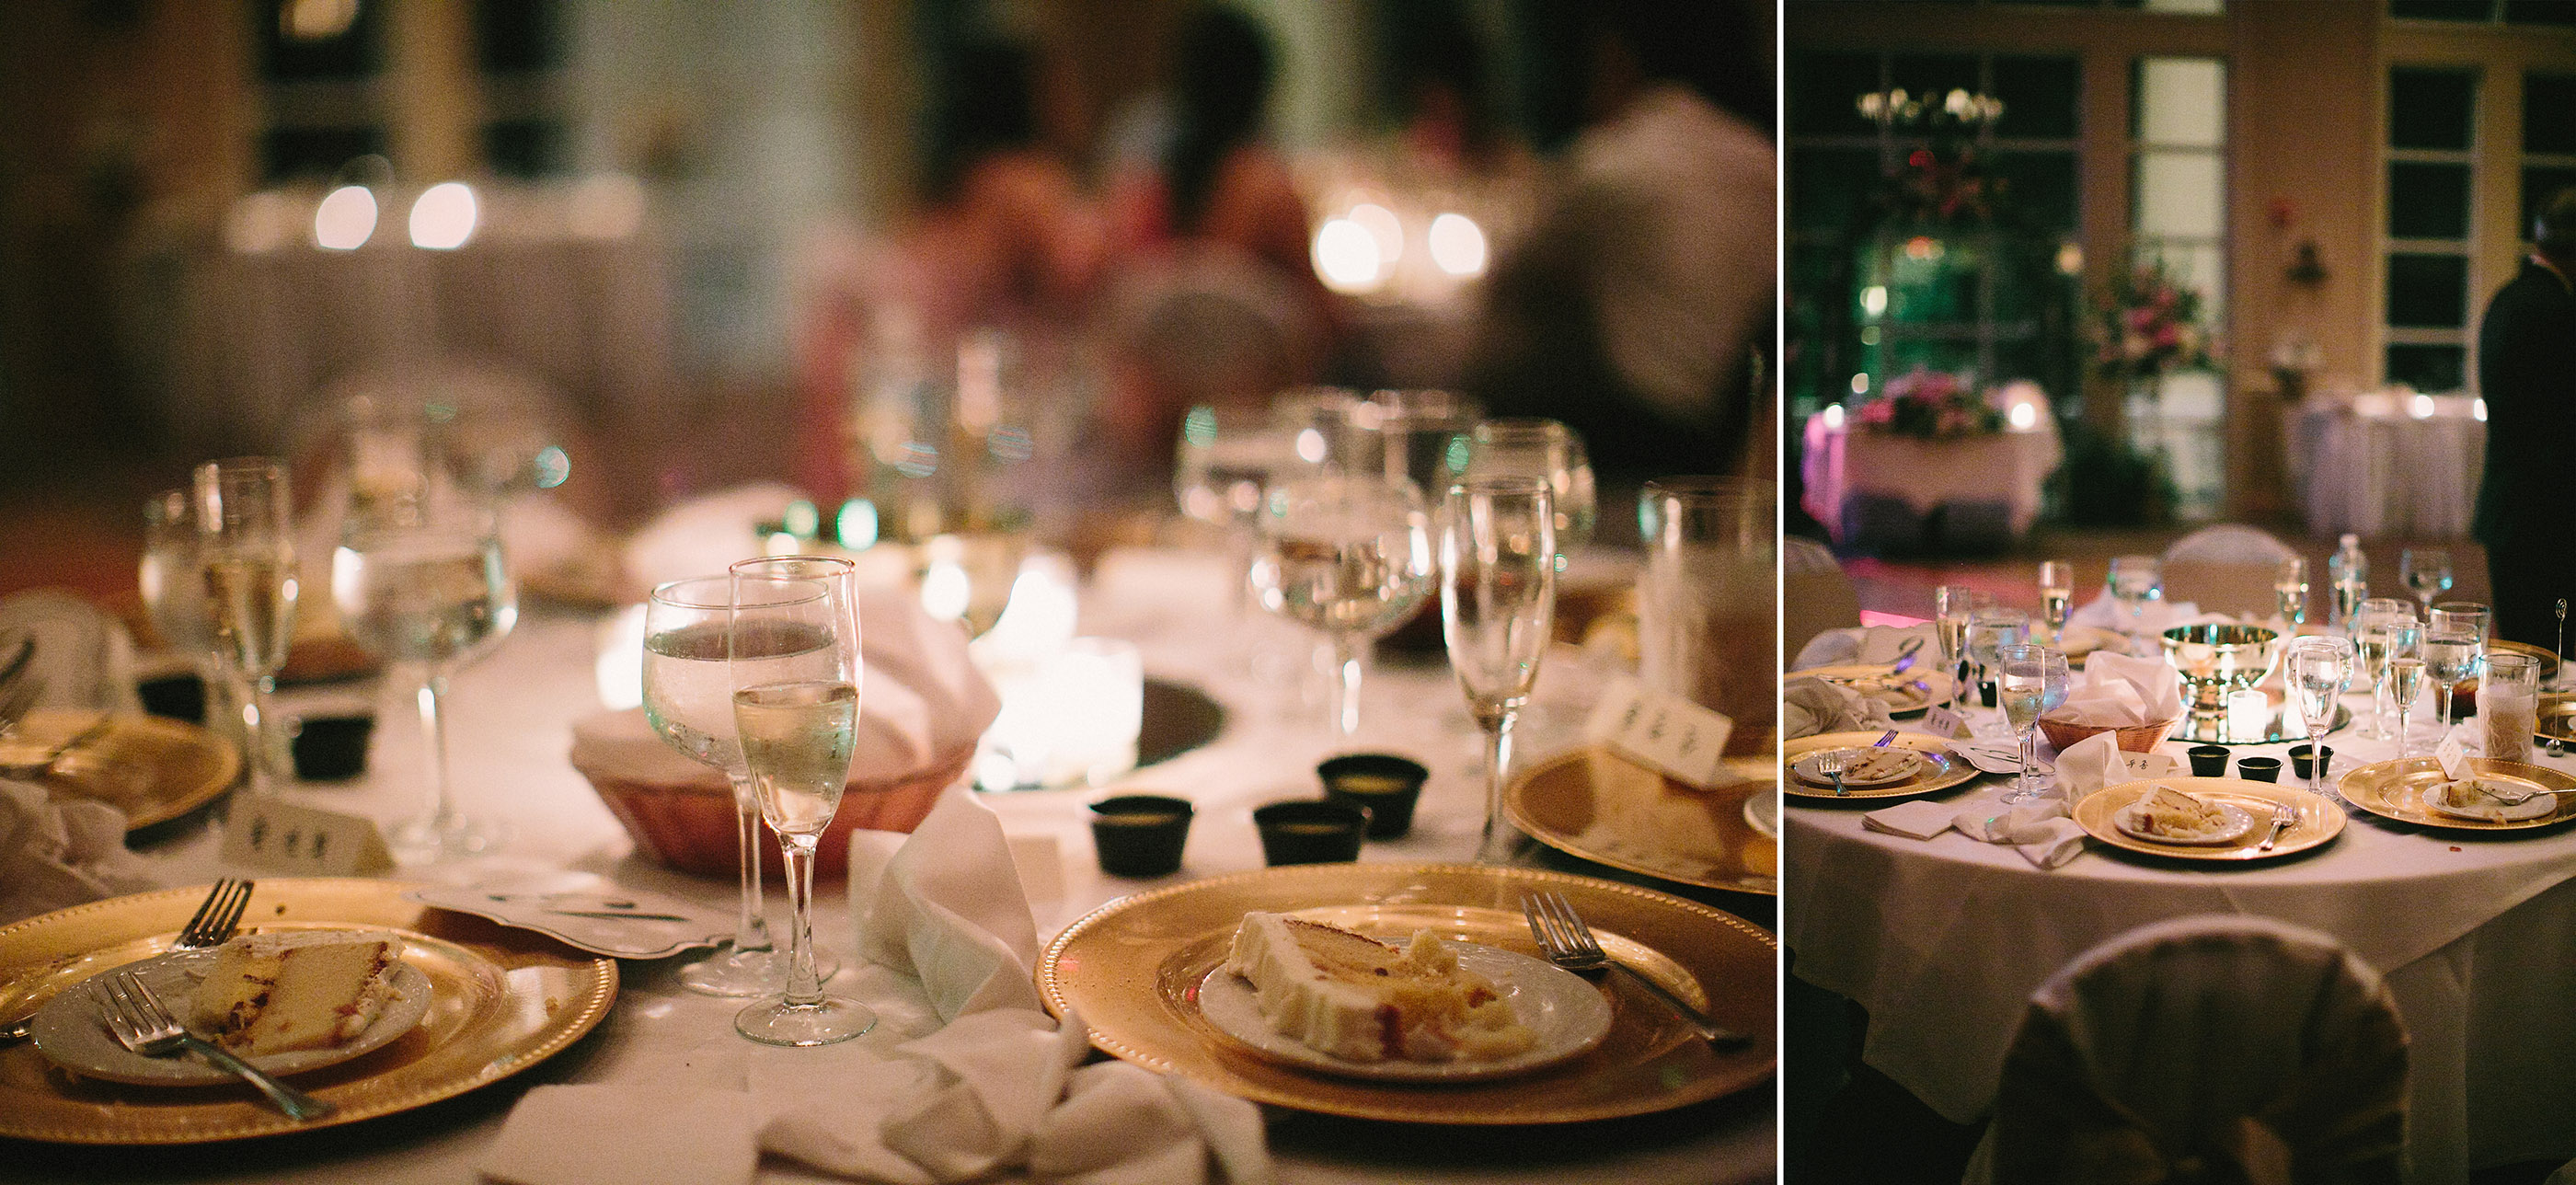 Beautiful Wedding Table Decorations